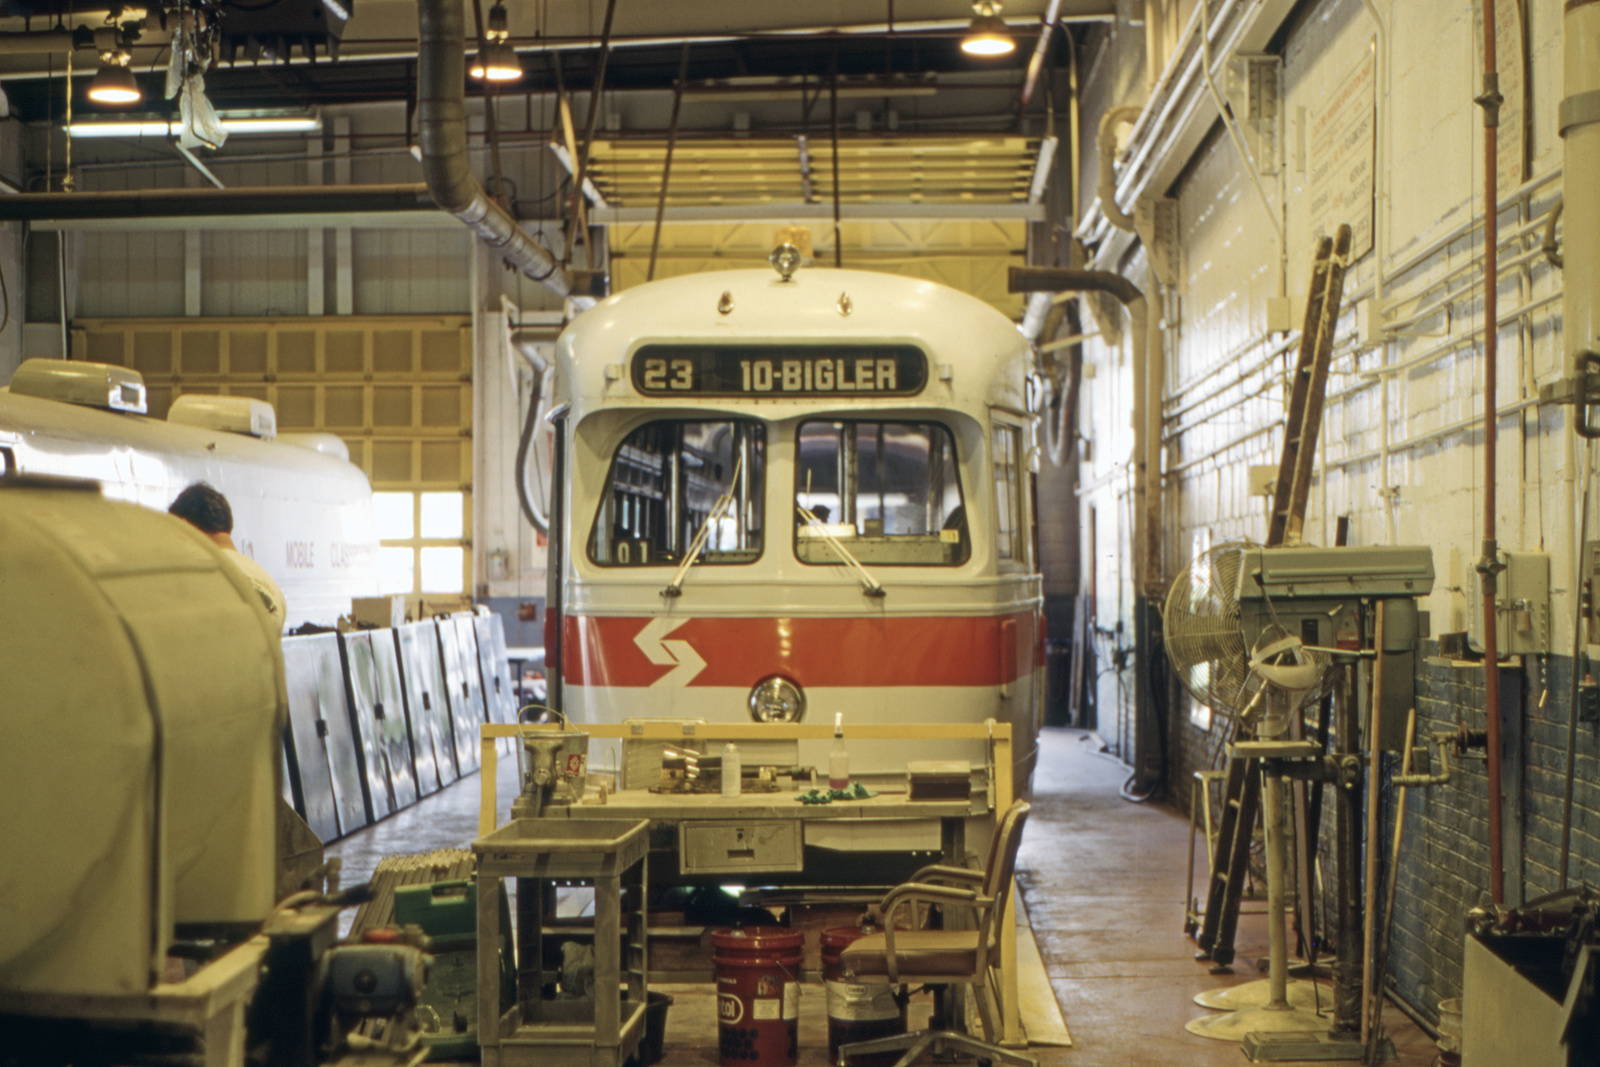 (658k, 1600x1067)<br><b>Country:</b> United States<br><b>City:</b> Philadelphia, PA<br><b>System:</b> SEPTA (or Predecessor)<br><b>Line:</b> Rt. 23-Germantown<br><b>Location:</b> Germantown Depot<br><b>Car:</b> PTC/SEPTA Postwar All-electric PCC (St.Louis, 1948) 2182 <br><b>Collection of:</b> David Pirmann<br><b>Date:</b> 5/15/1995<br><b>Viewed (this week/total):</b> 0 / 73